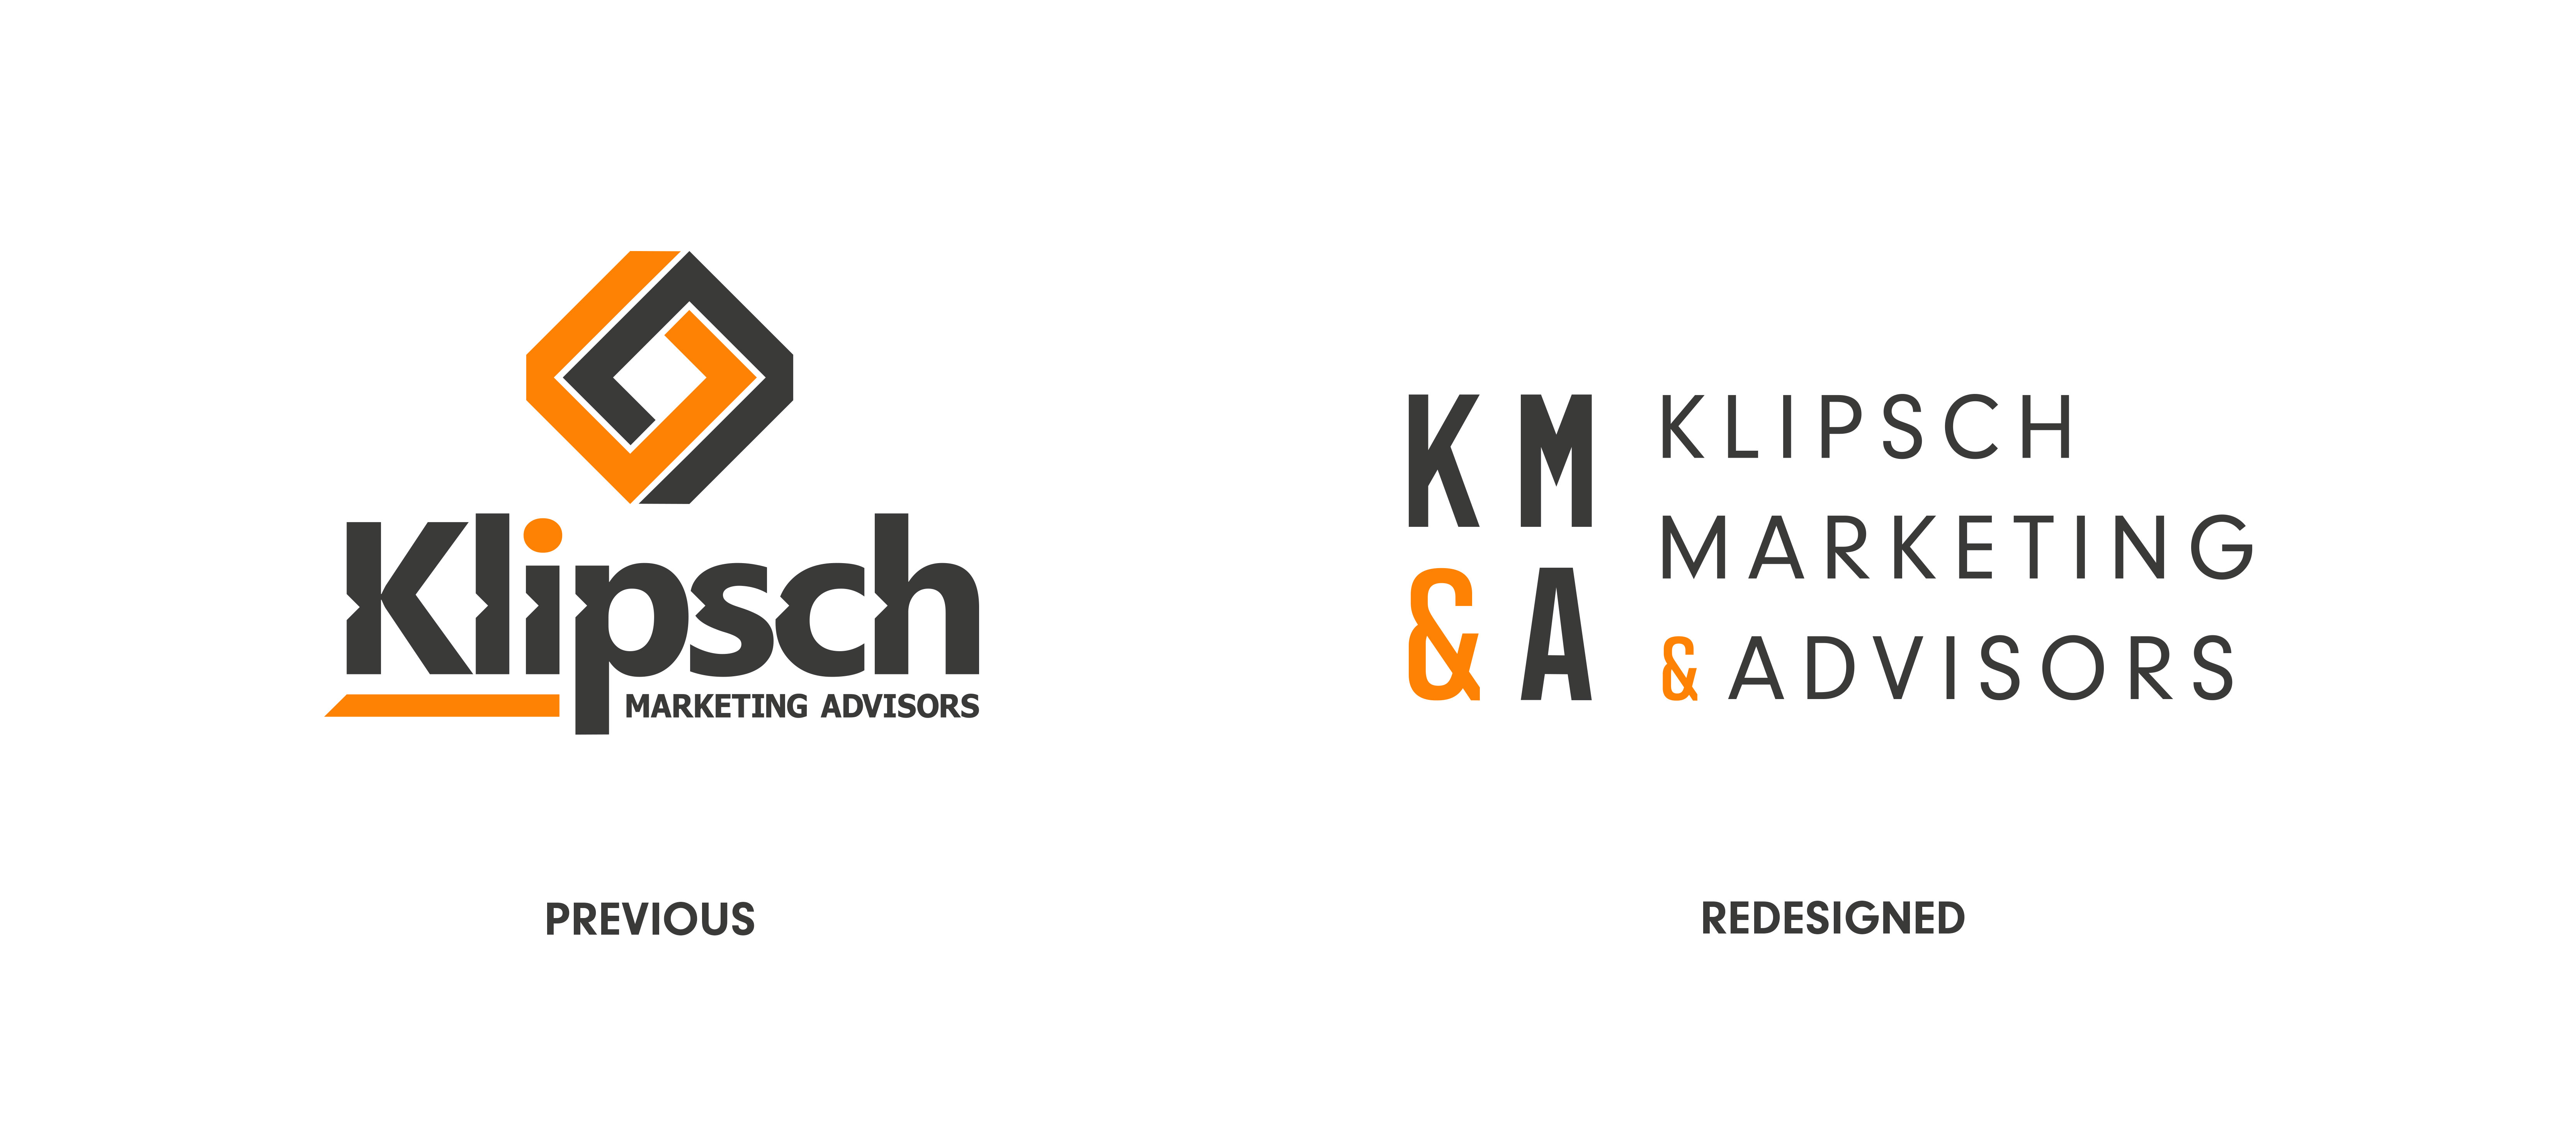 KMA Rebrand Pic1 1 Brand Maintenance: KM&A